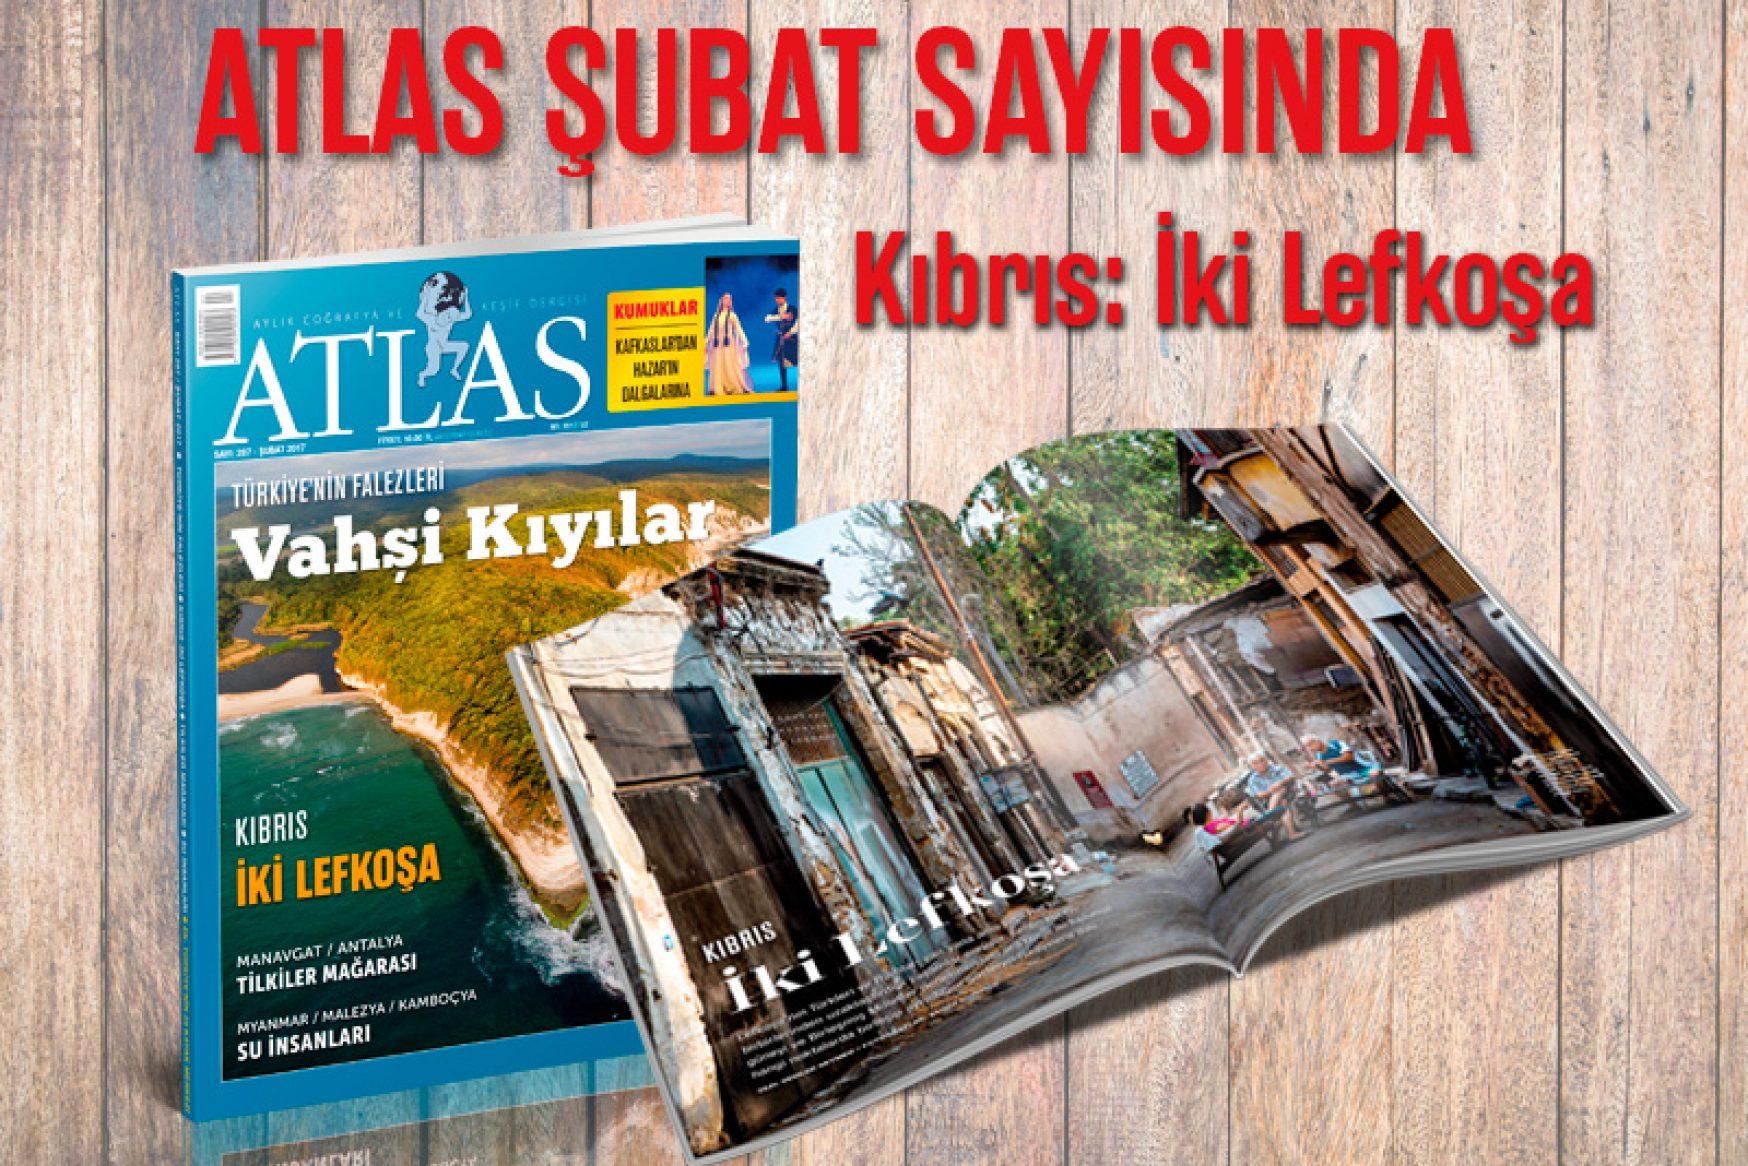 Kıbrıs: İki Lefkoşa